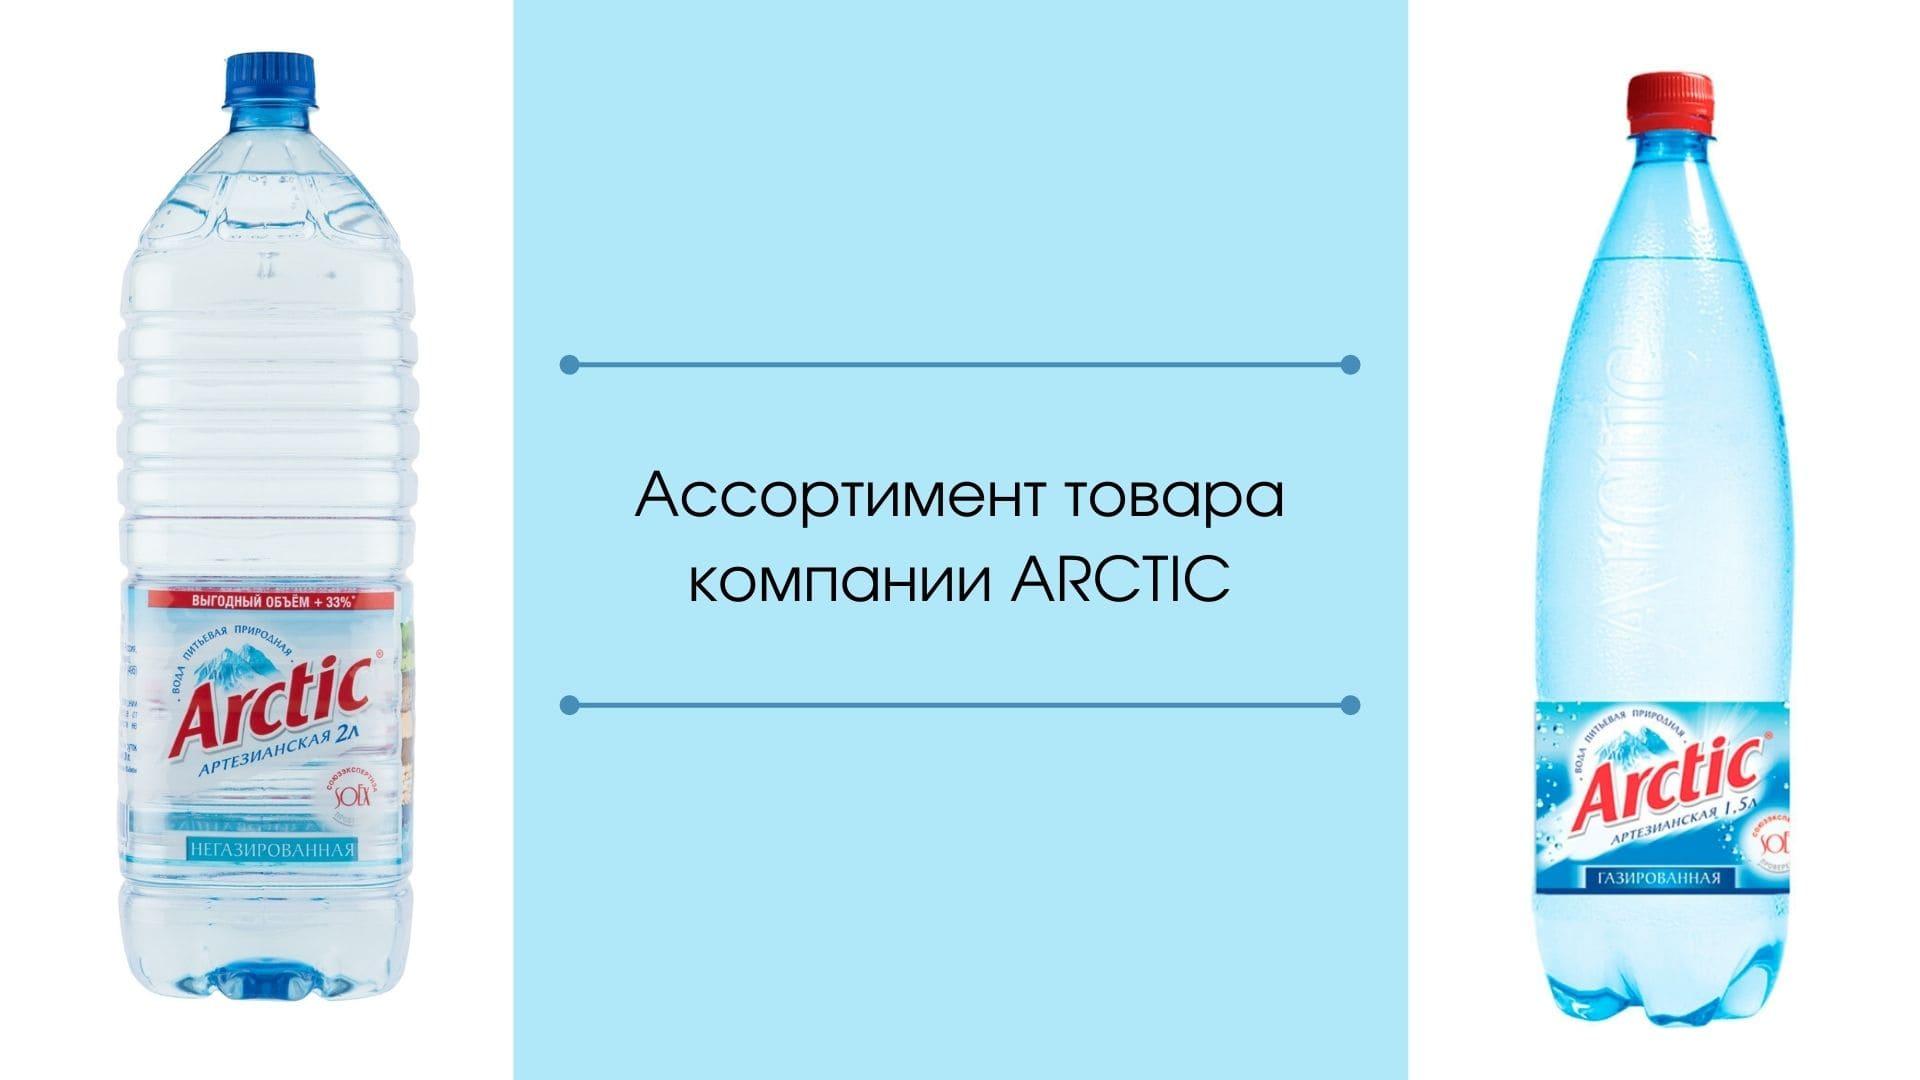 Бренд Арктик ассортимент товара